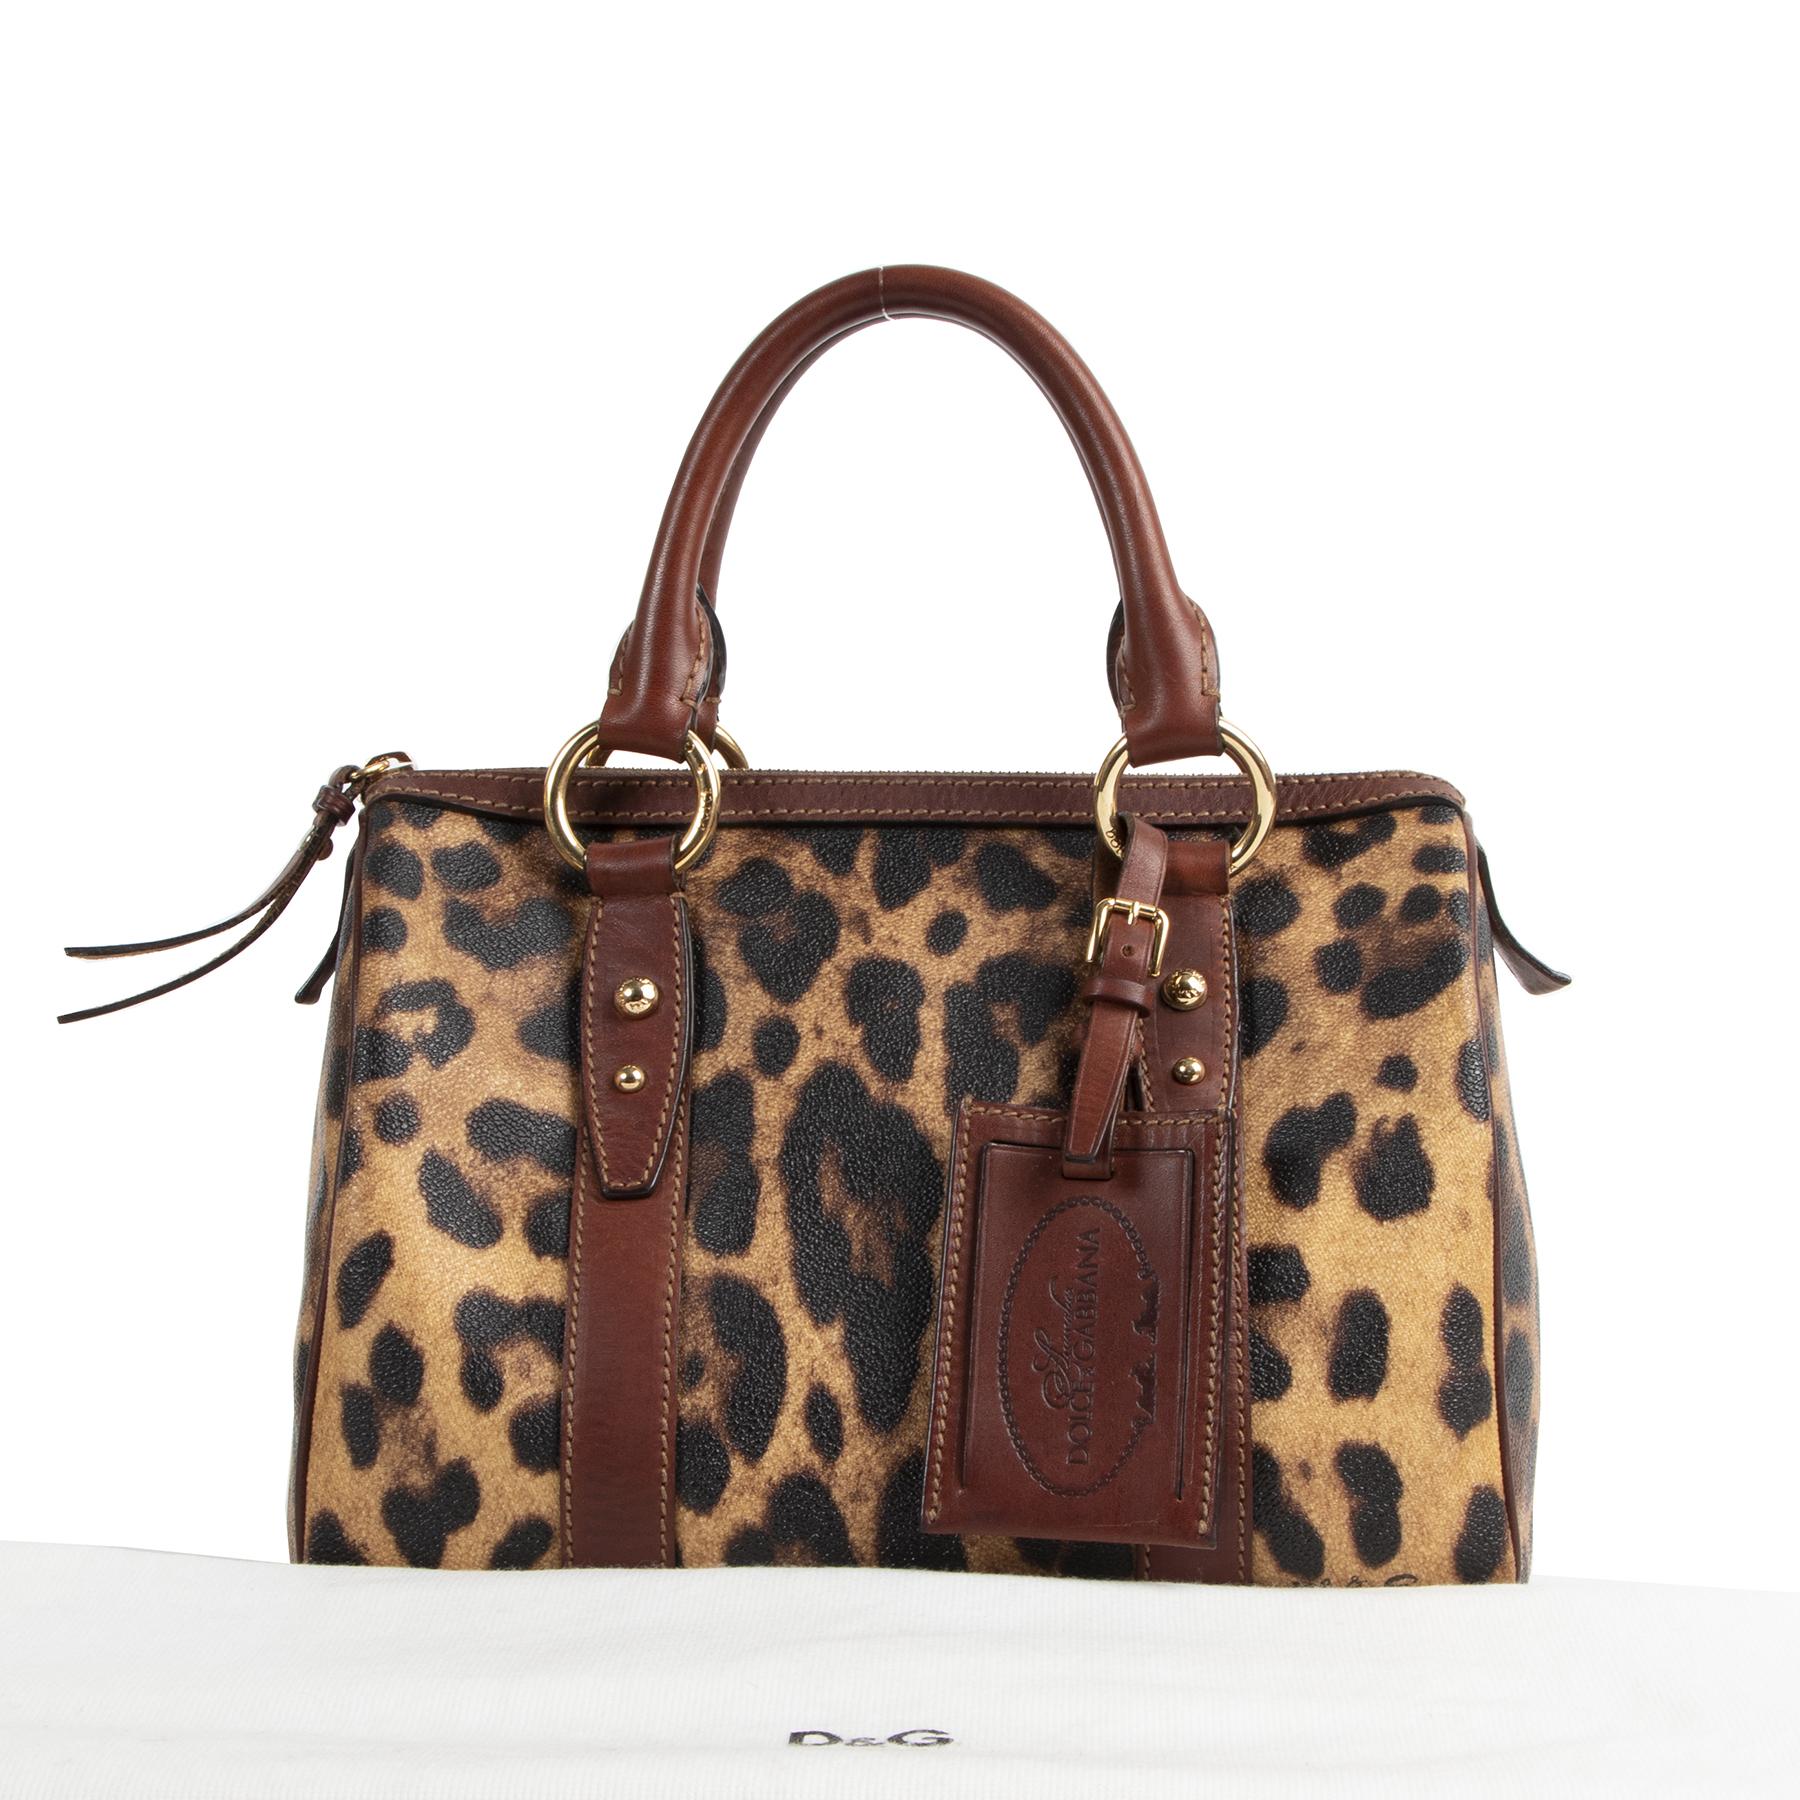 skip the waiting list Dolce & Gabbana Leopard Boston Bag